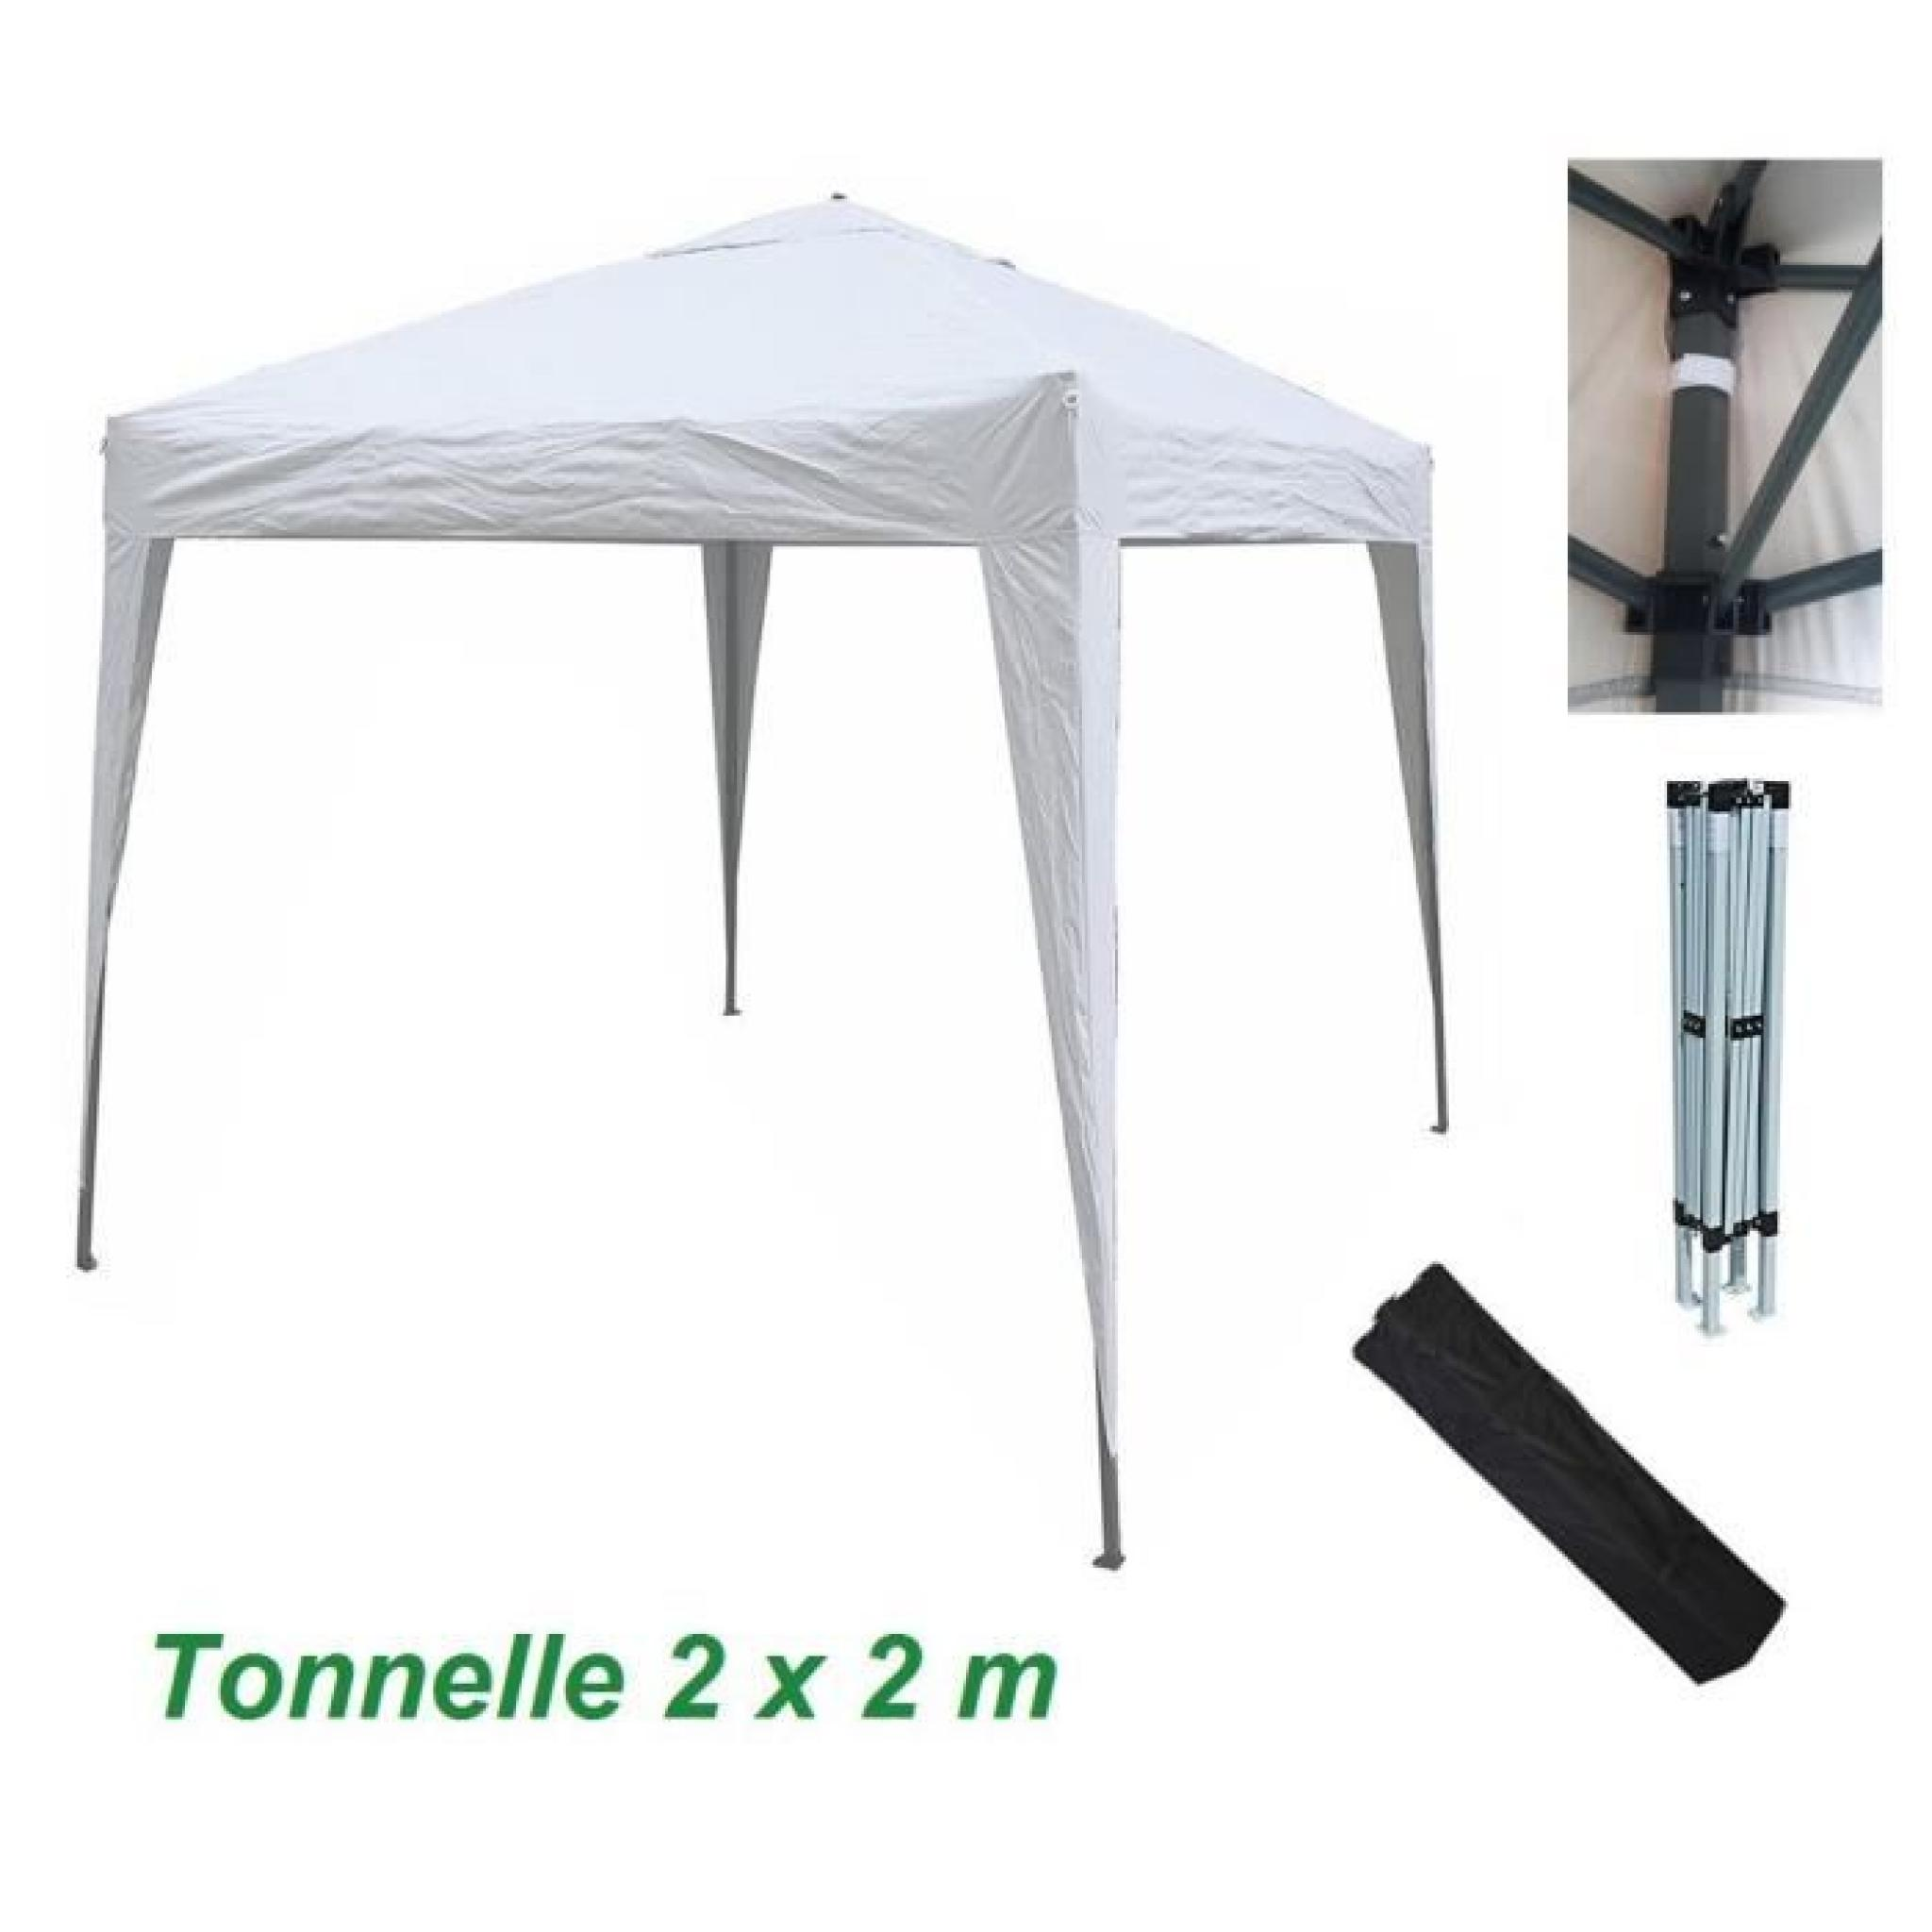 Gazébo-kioske-pavillon-tente-tonnelle-auvent-abri de jardin pliable ...